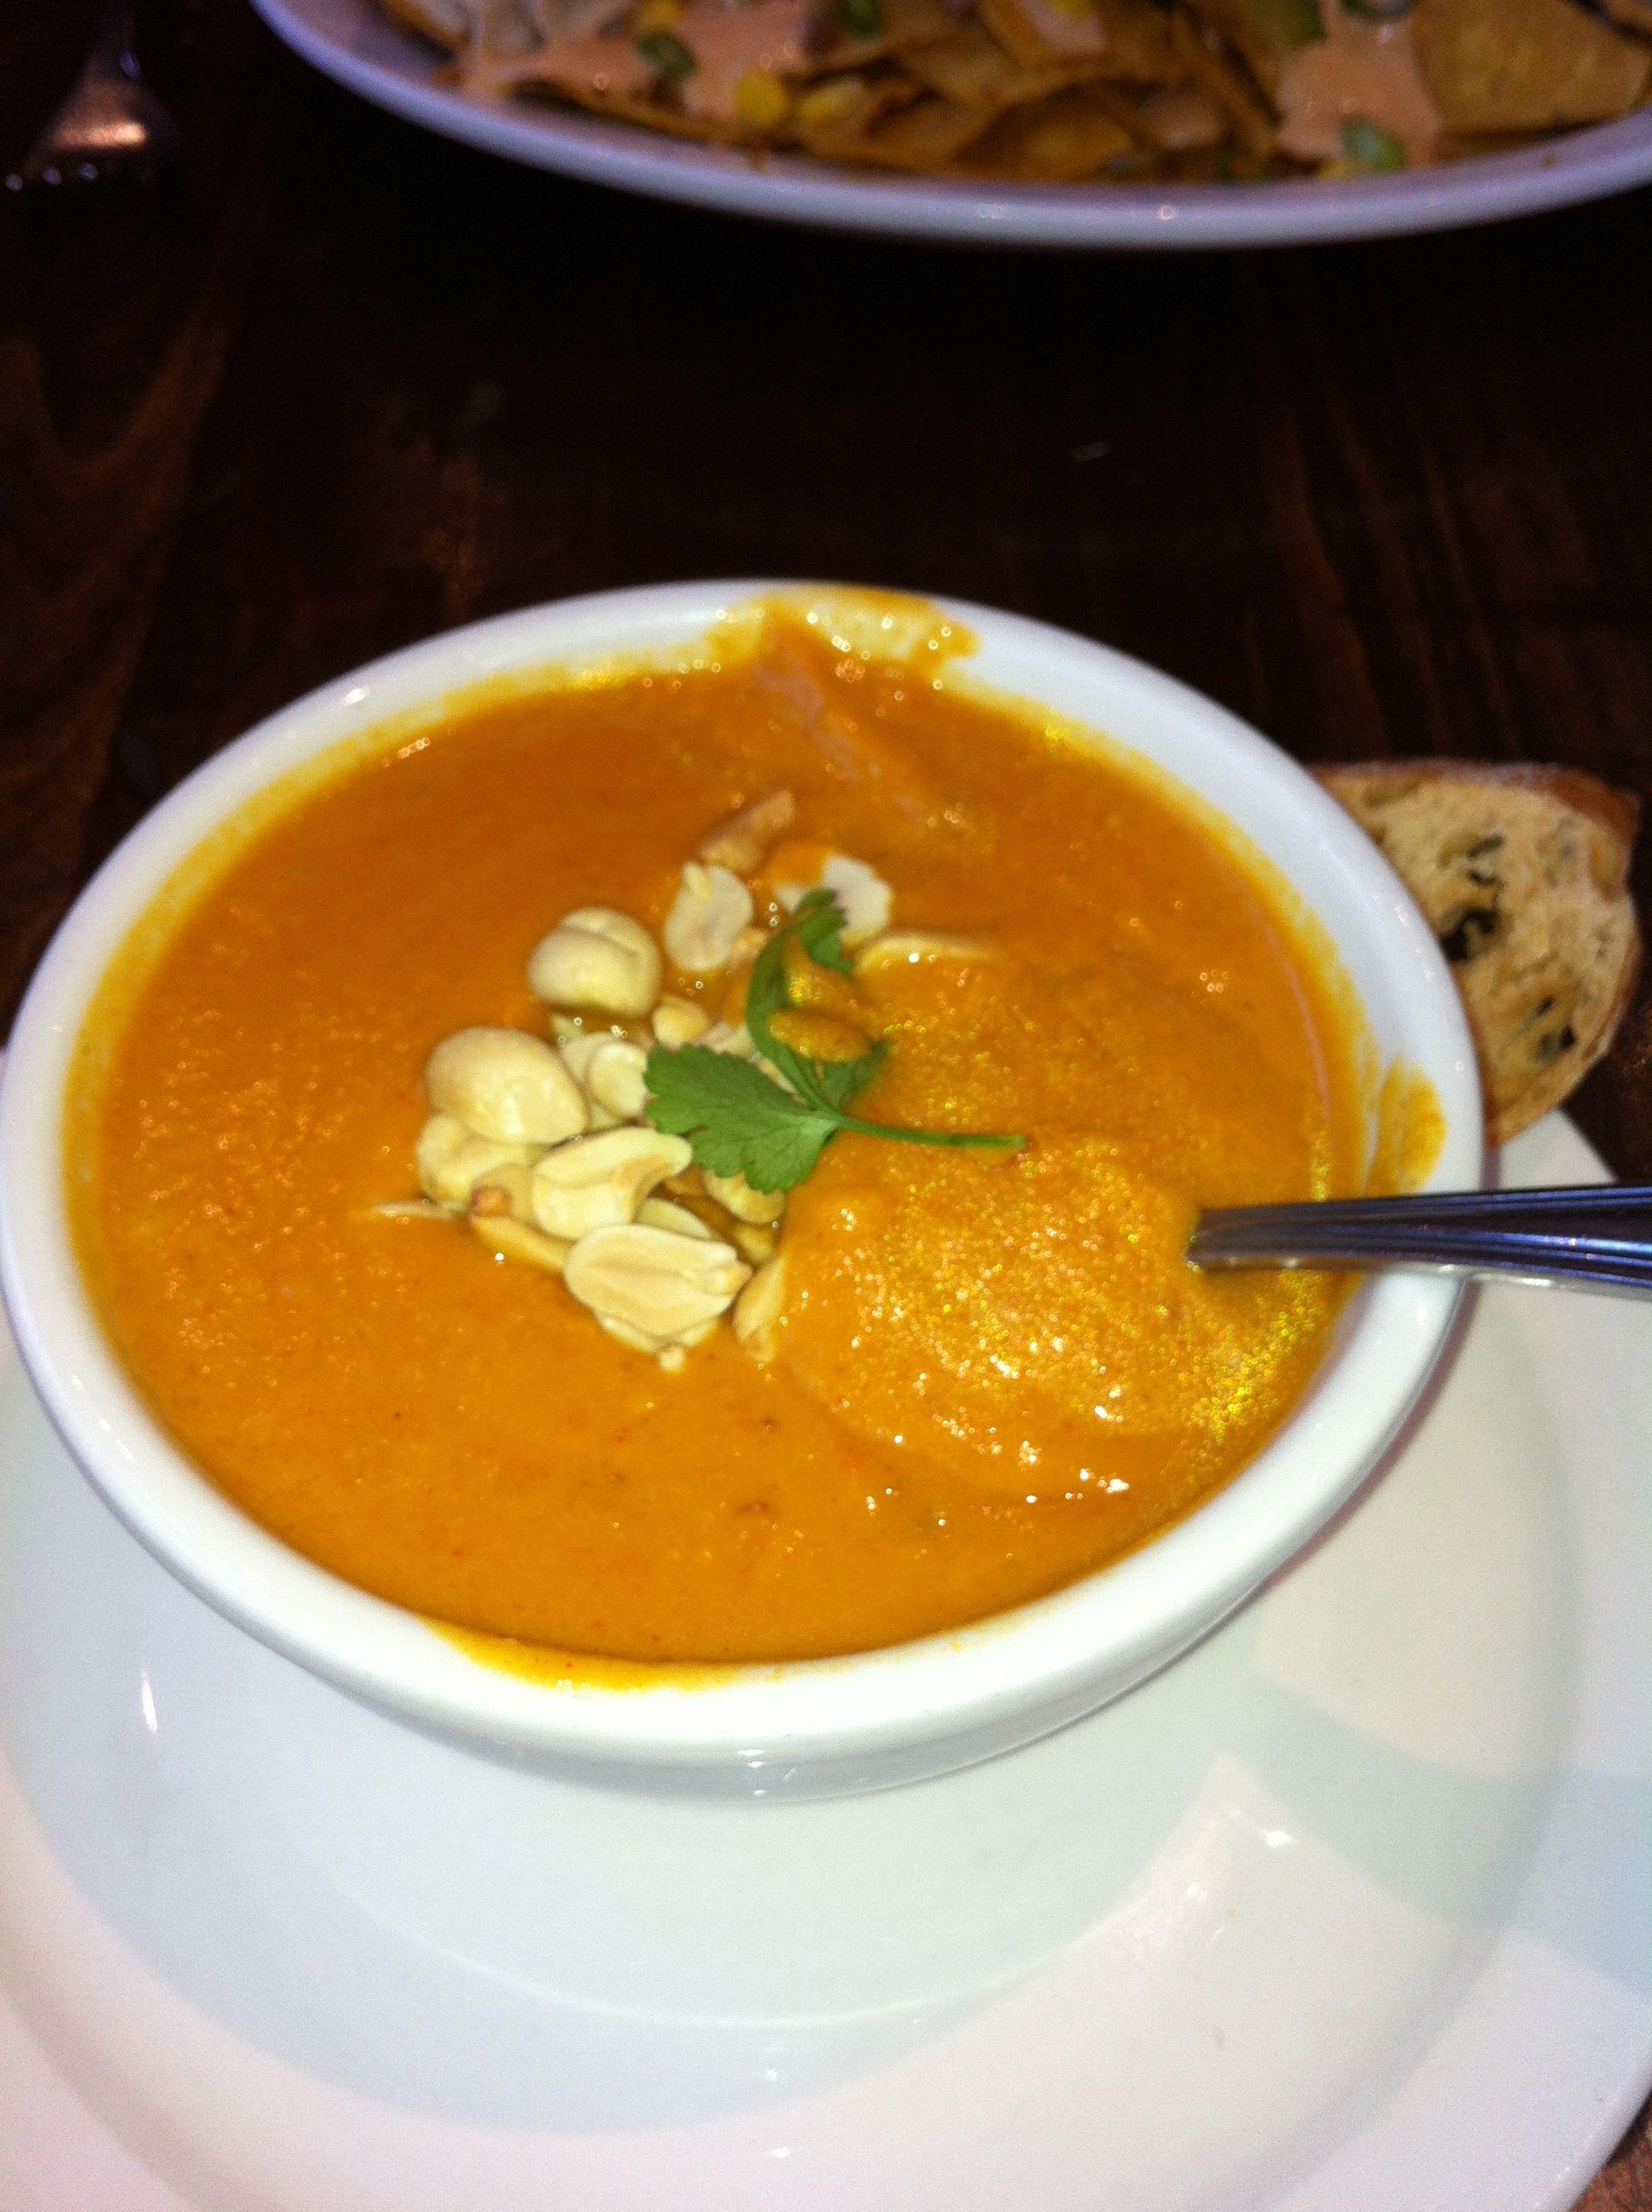 Vegan African peanut soup yummy